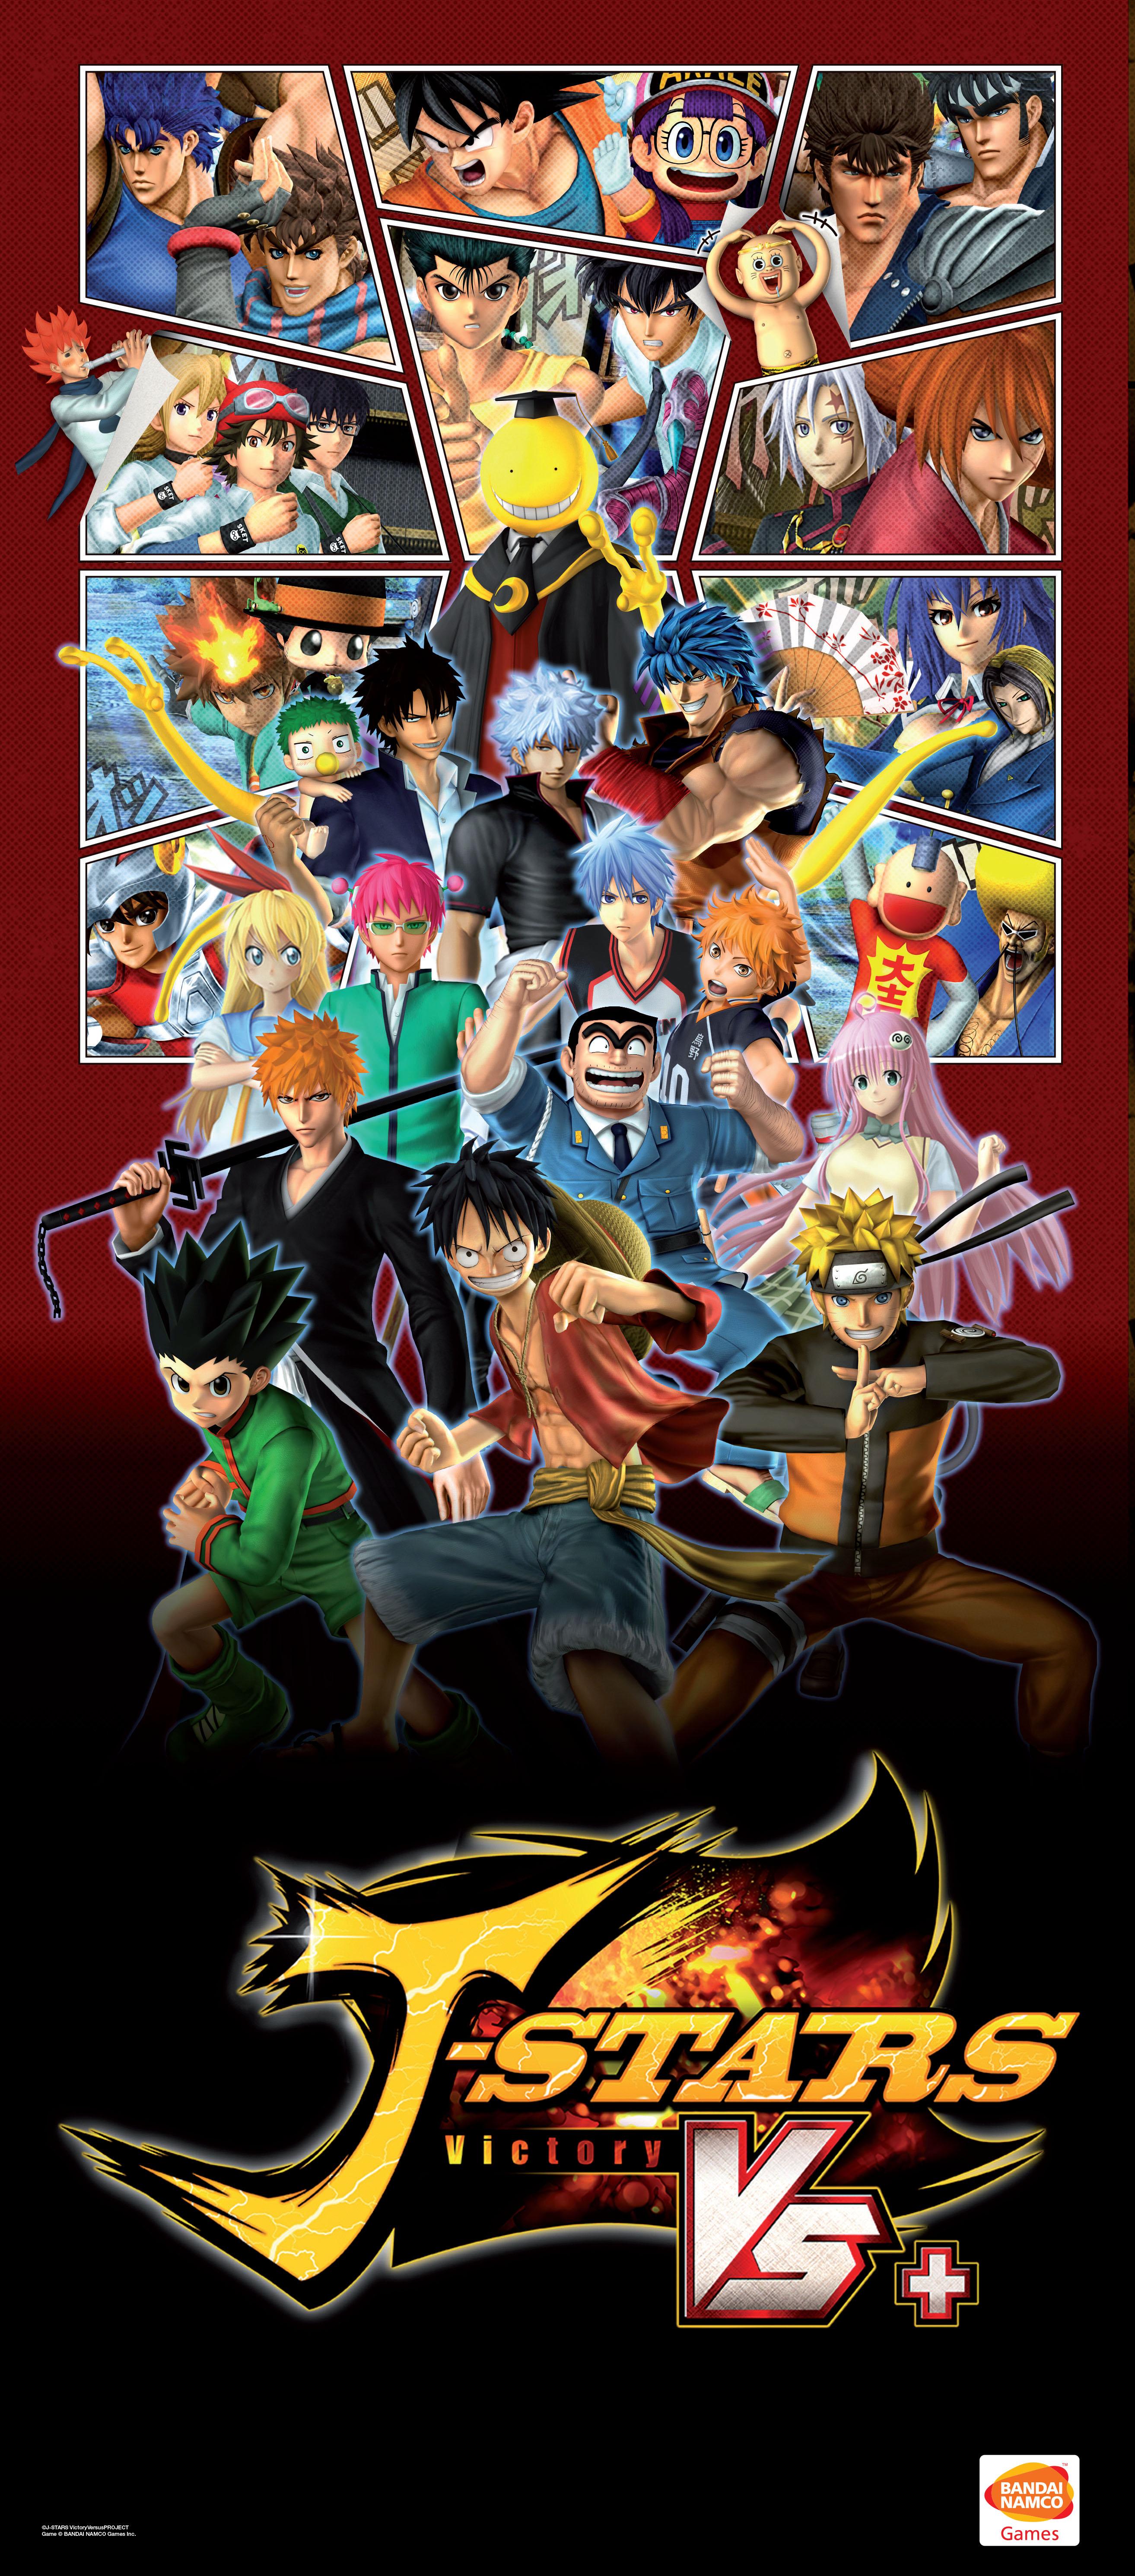 J-Stars Victory VS+ Poster Haruhichan.com